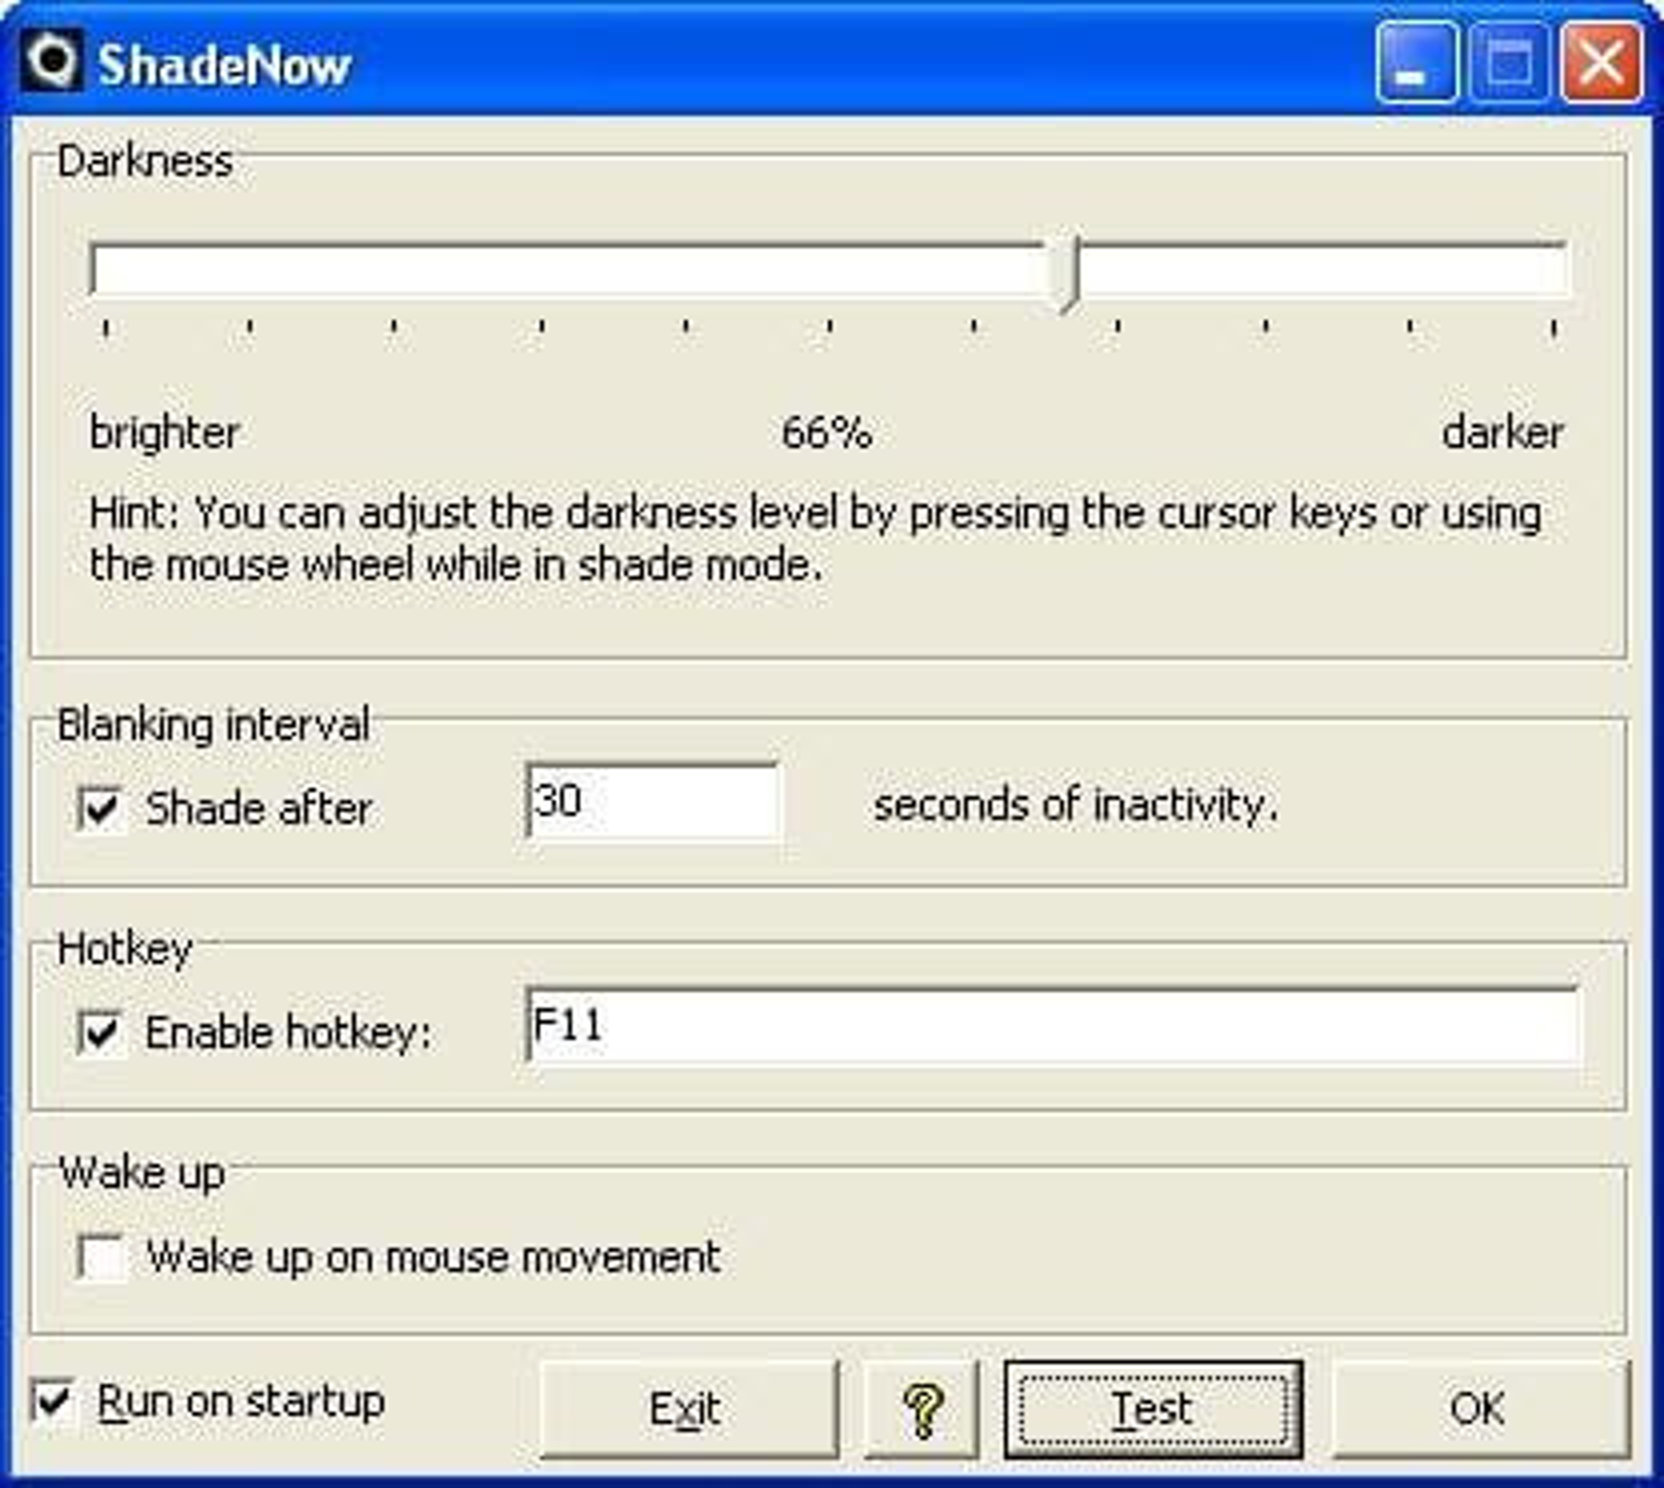 Shadenow